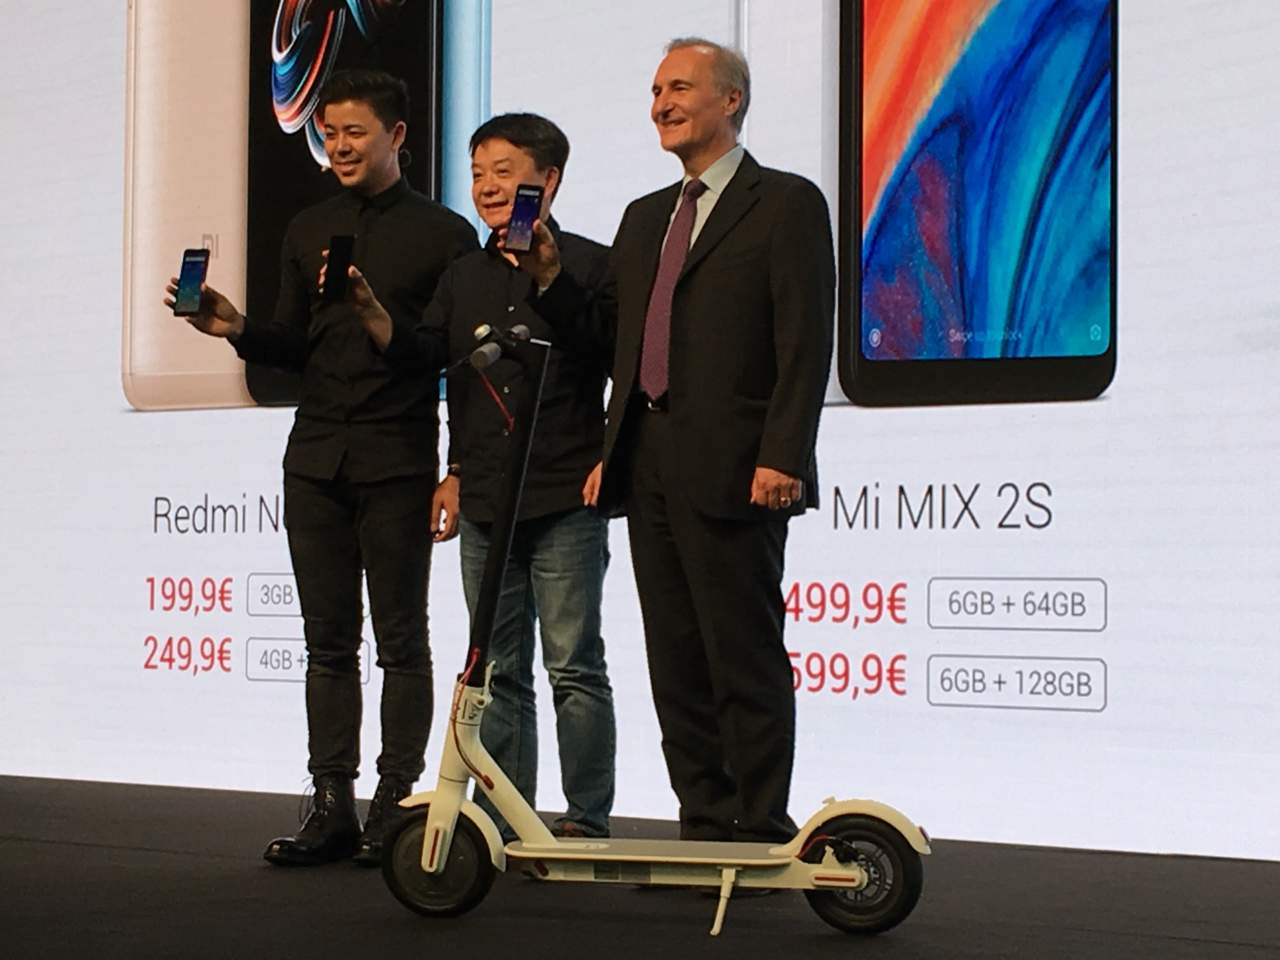 Xiaomi management